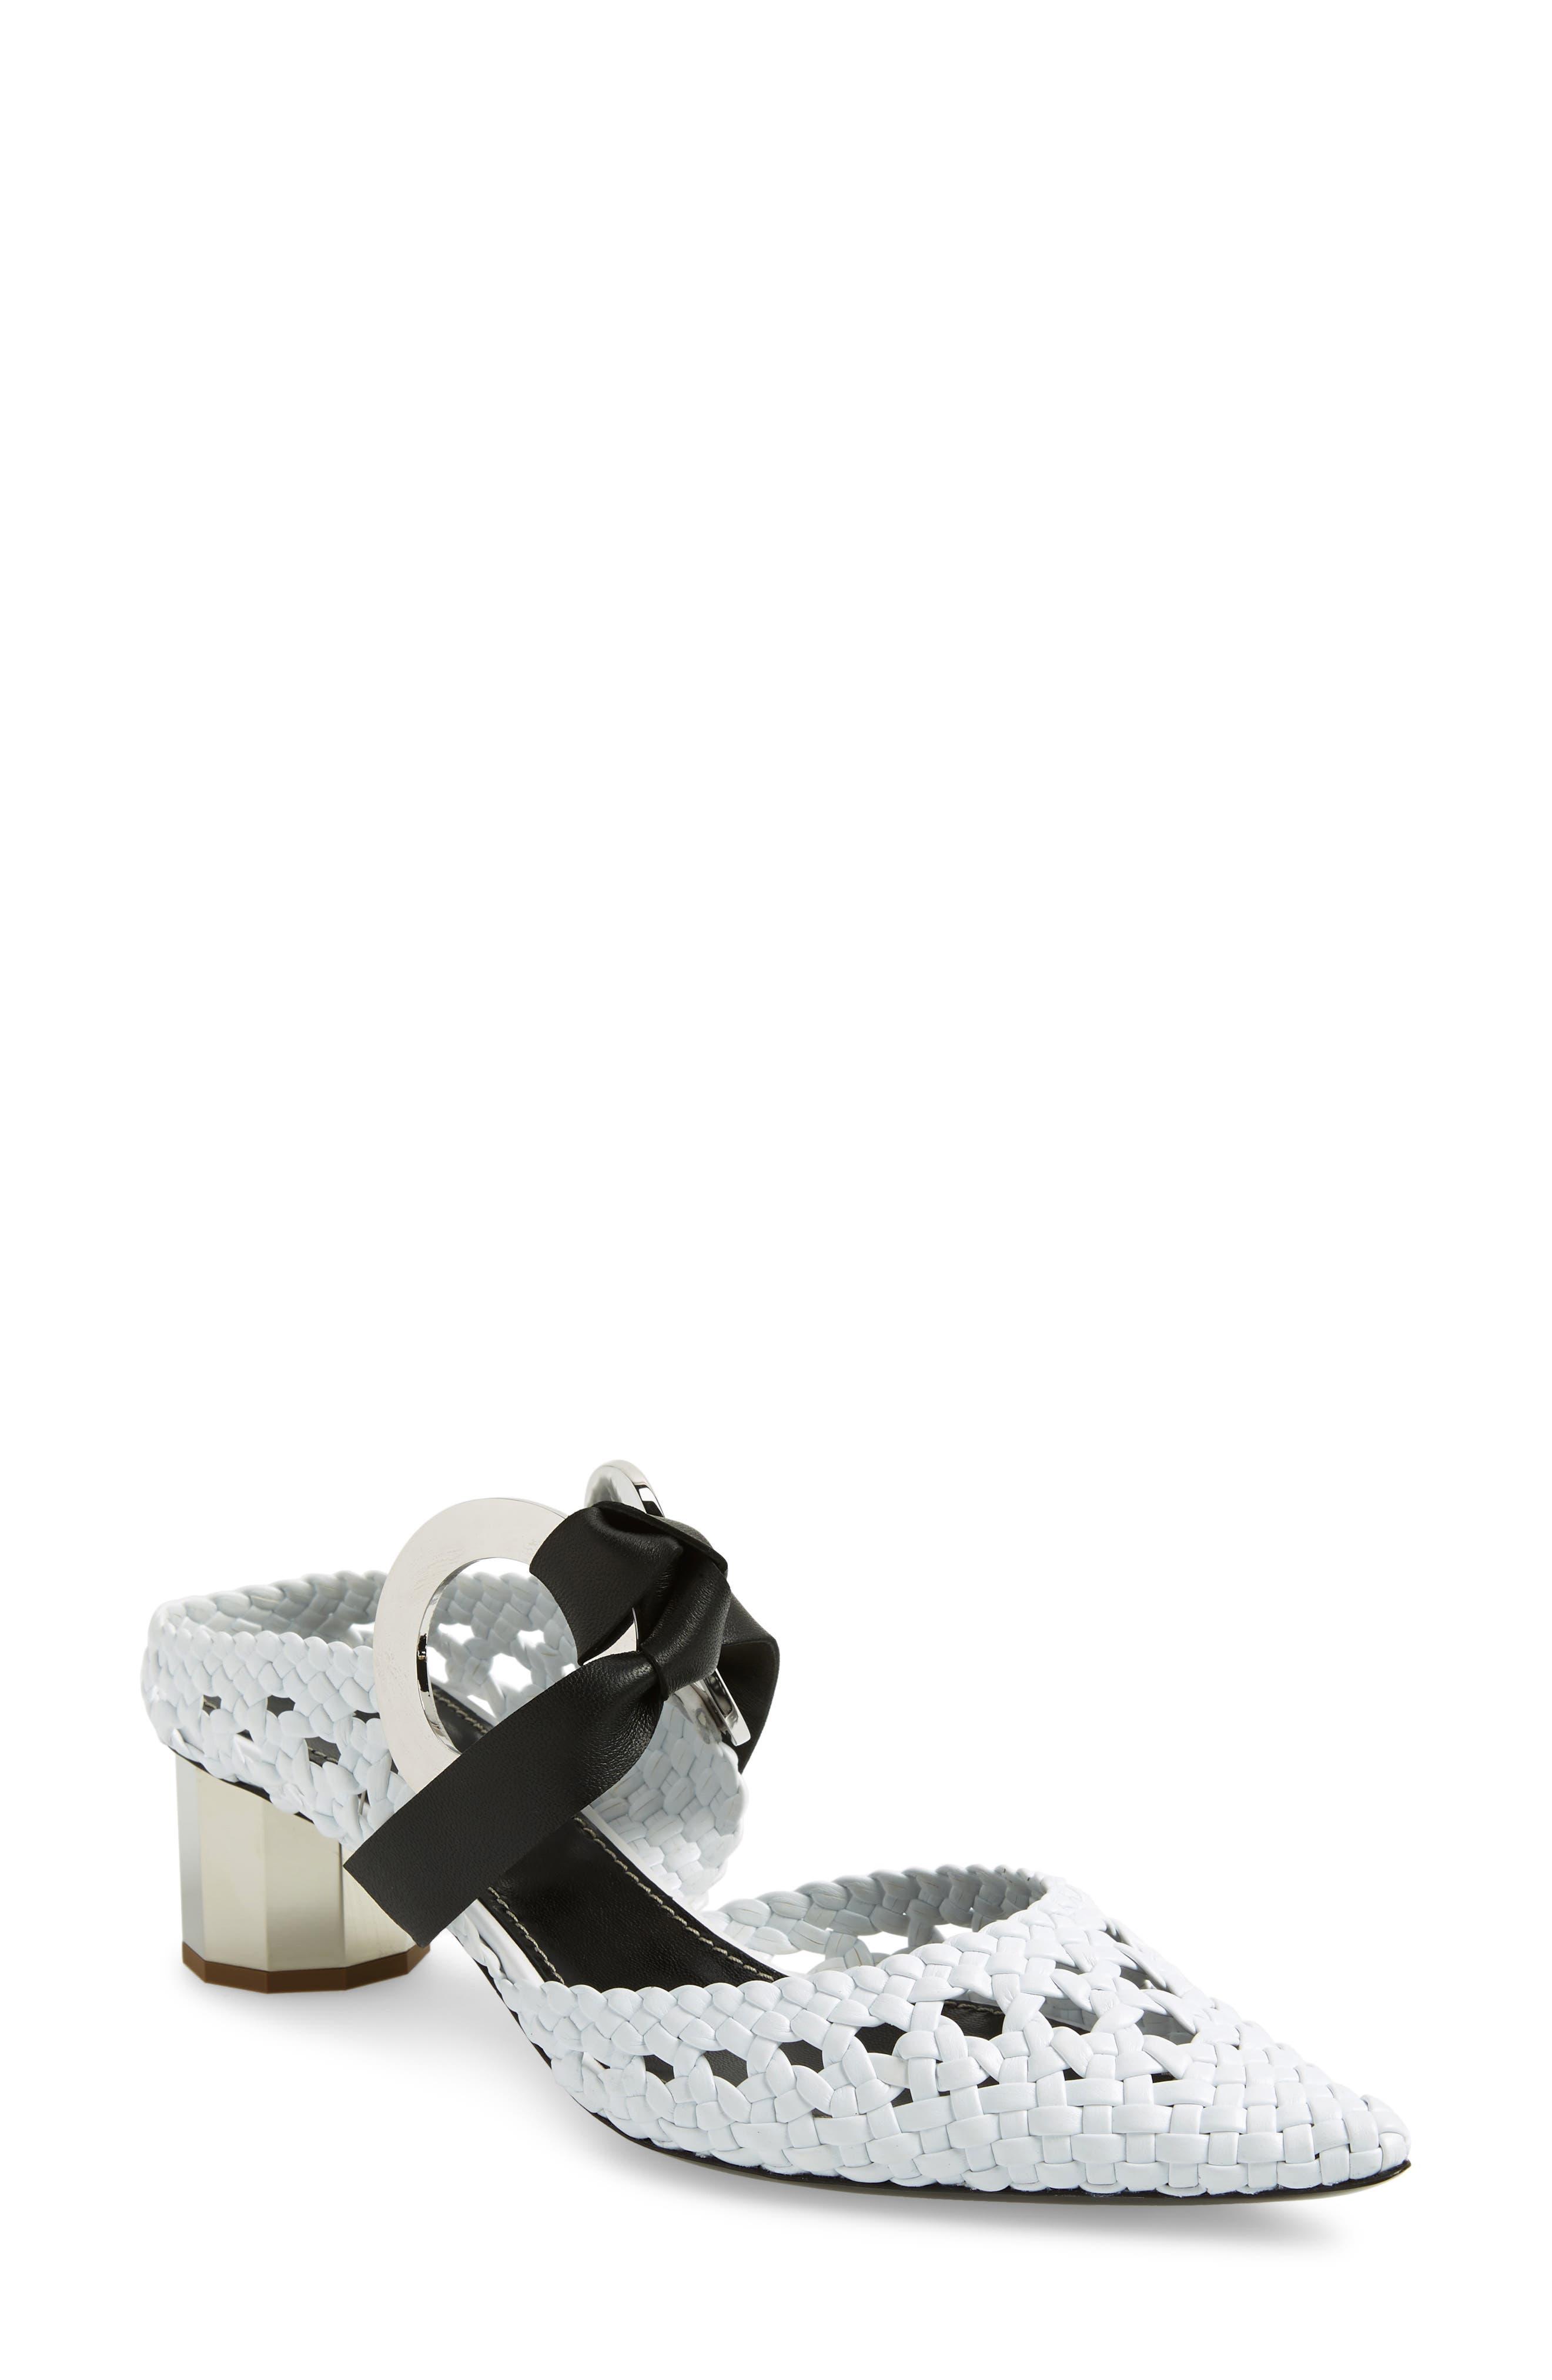 PROENZA SCHOULER Grommet Woven Pointy Toe Mule, Main, color, WHITE